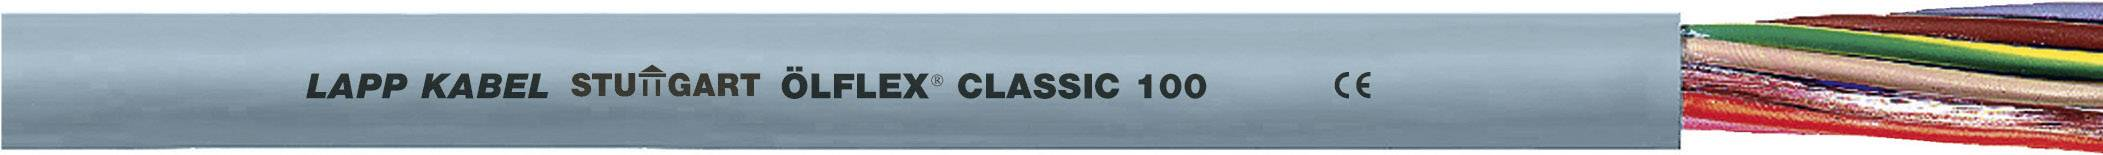 Kabel LappKabel Ölflex CLASSIC 100 5G16 (00101133), PVC, 22,8 mm, 750 V, šedá, 100 m